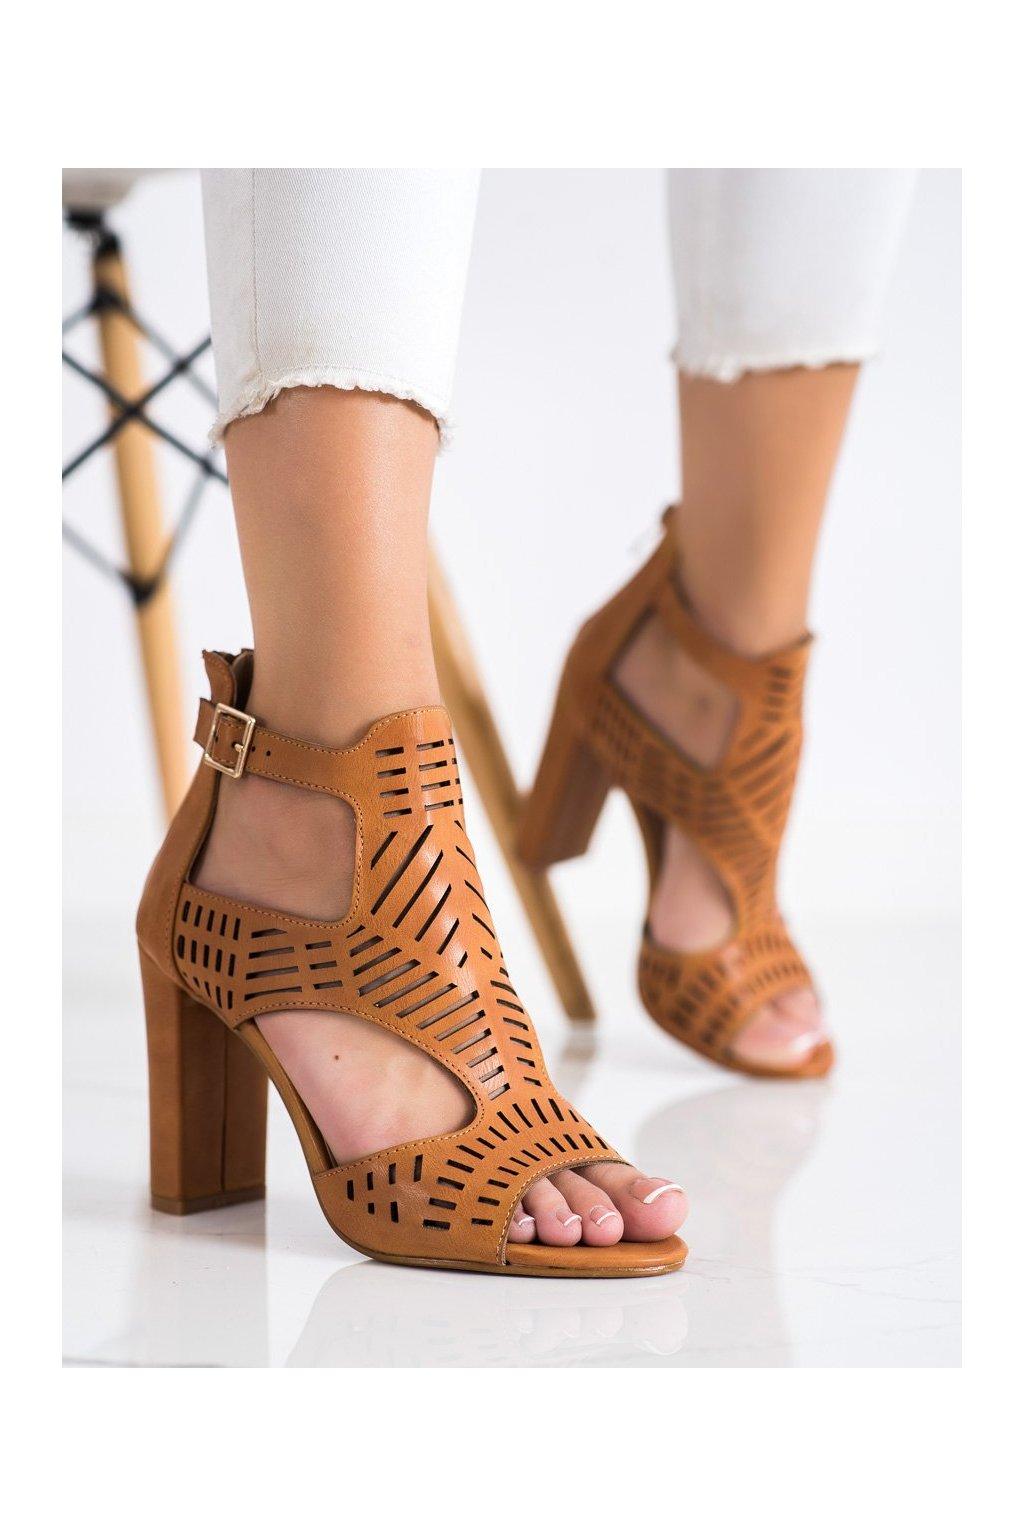 Hnedé dámske sandále Renda kod S-860C